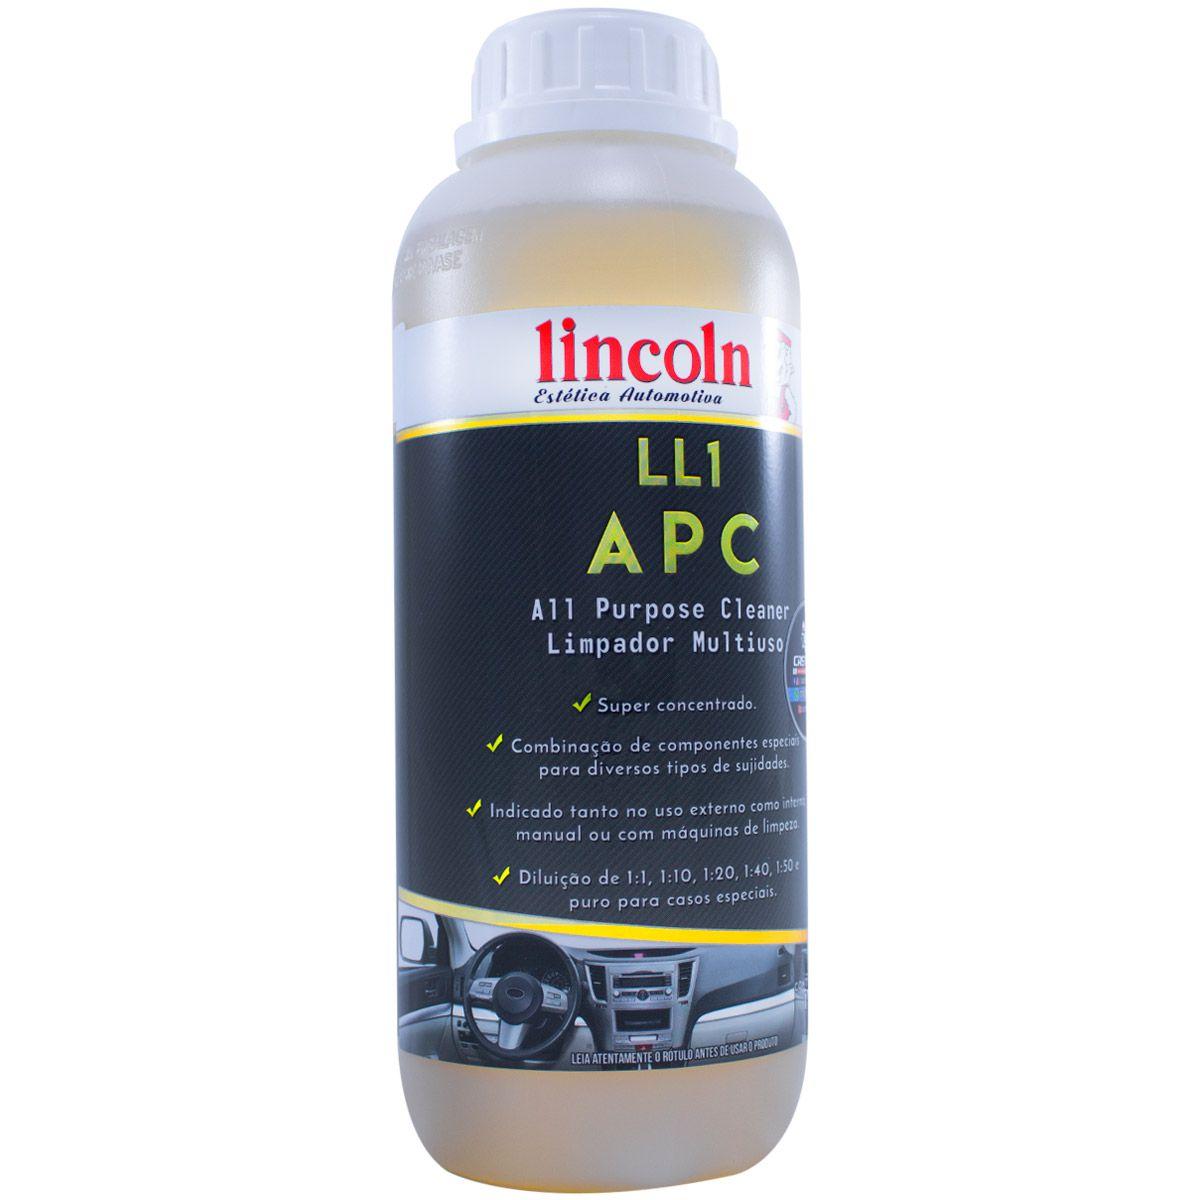 LL1 APC Limpador Multiuso Concentrado Lincoln - 1 Litro